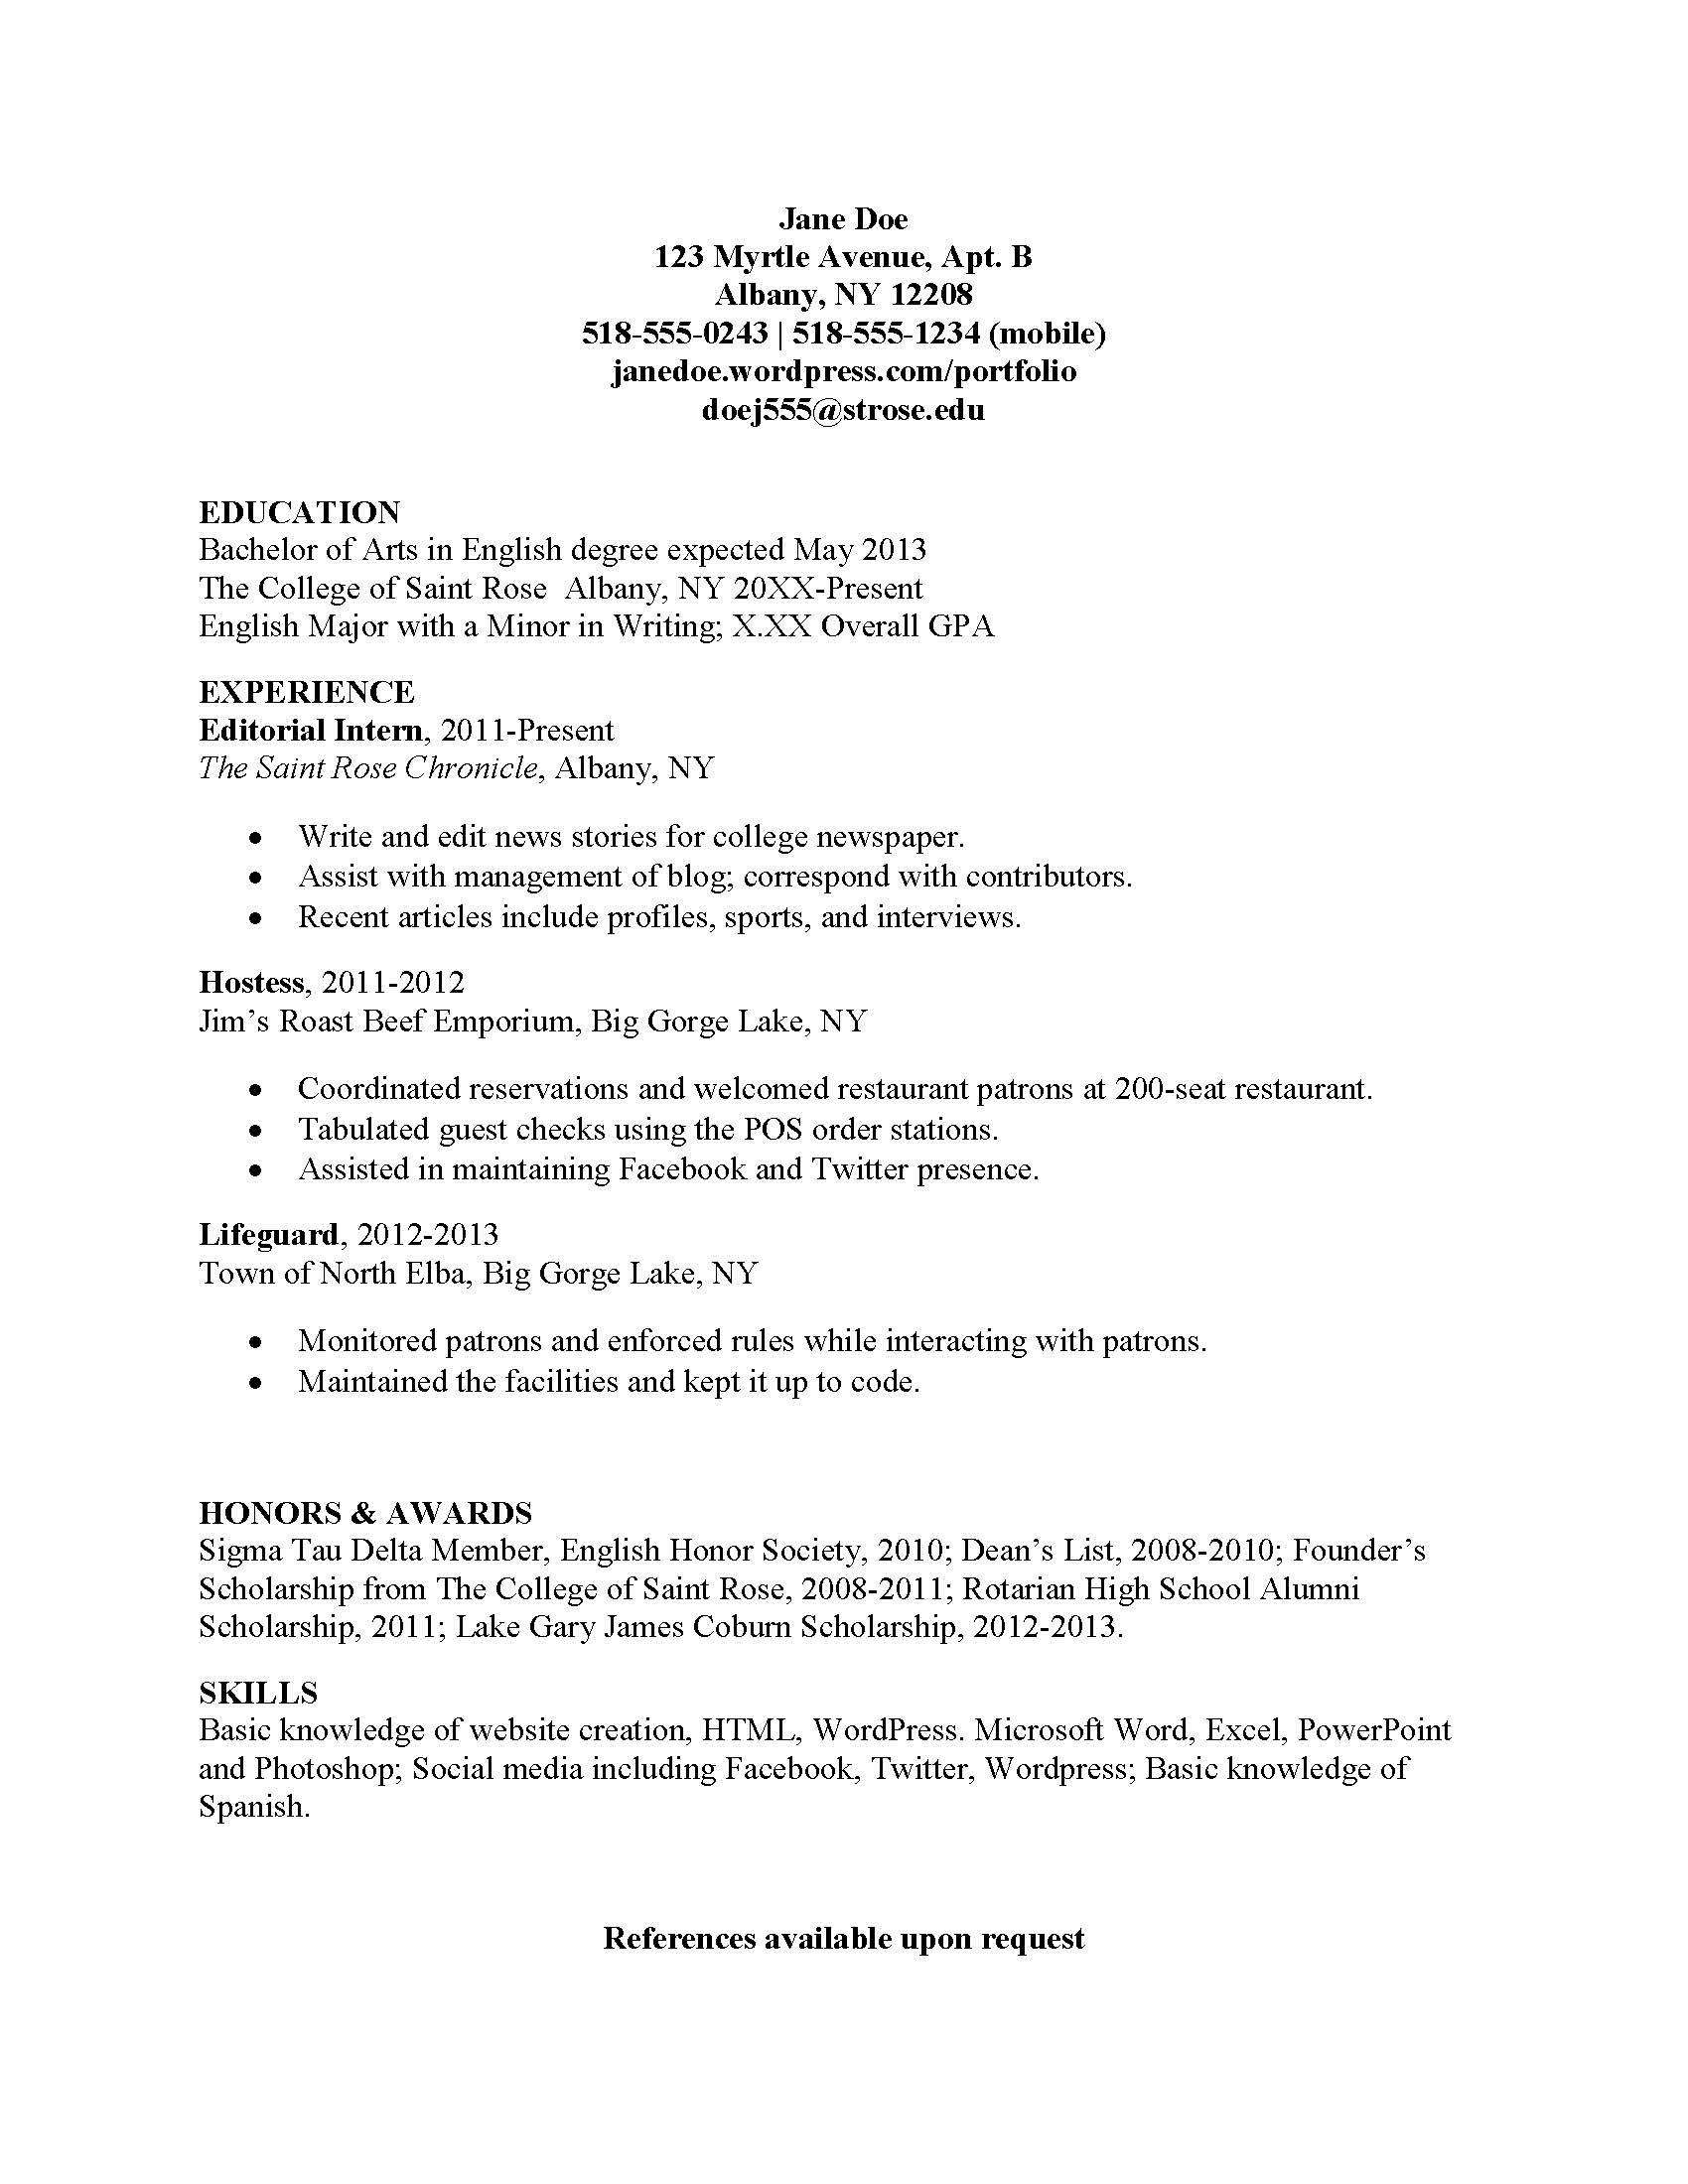 Resume Format Mla